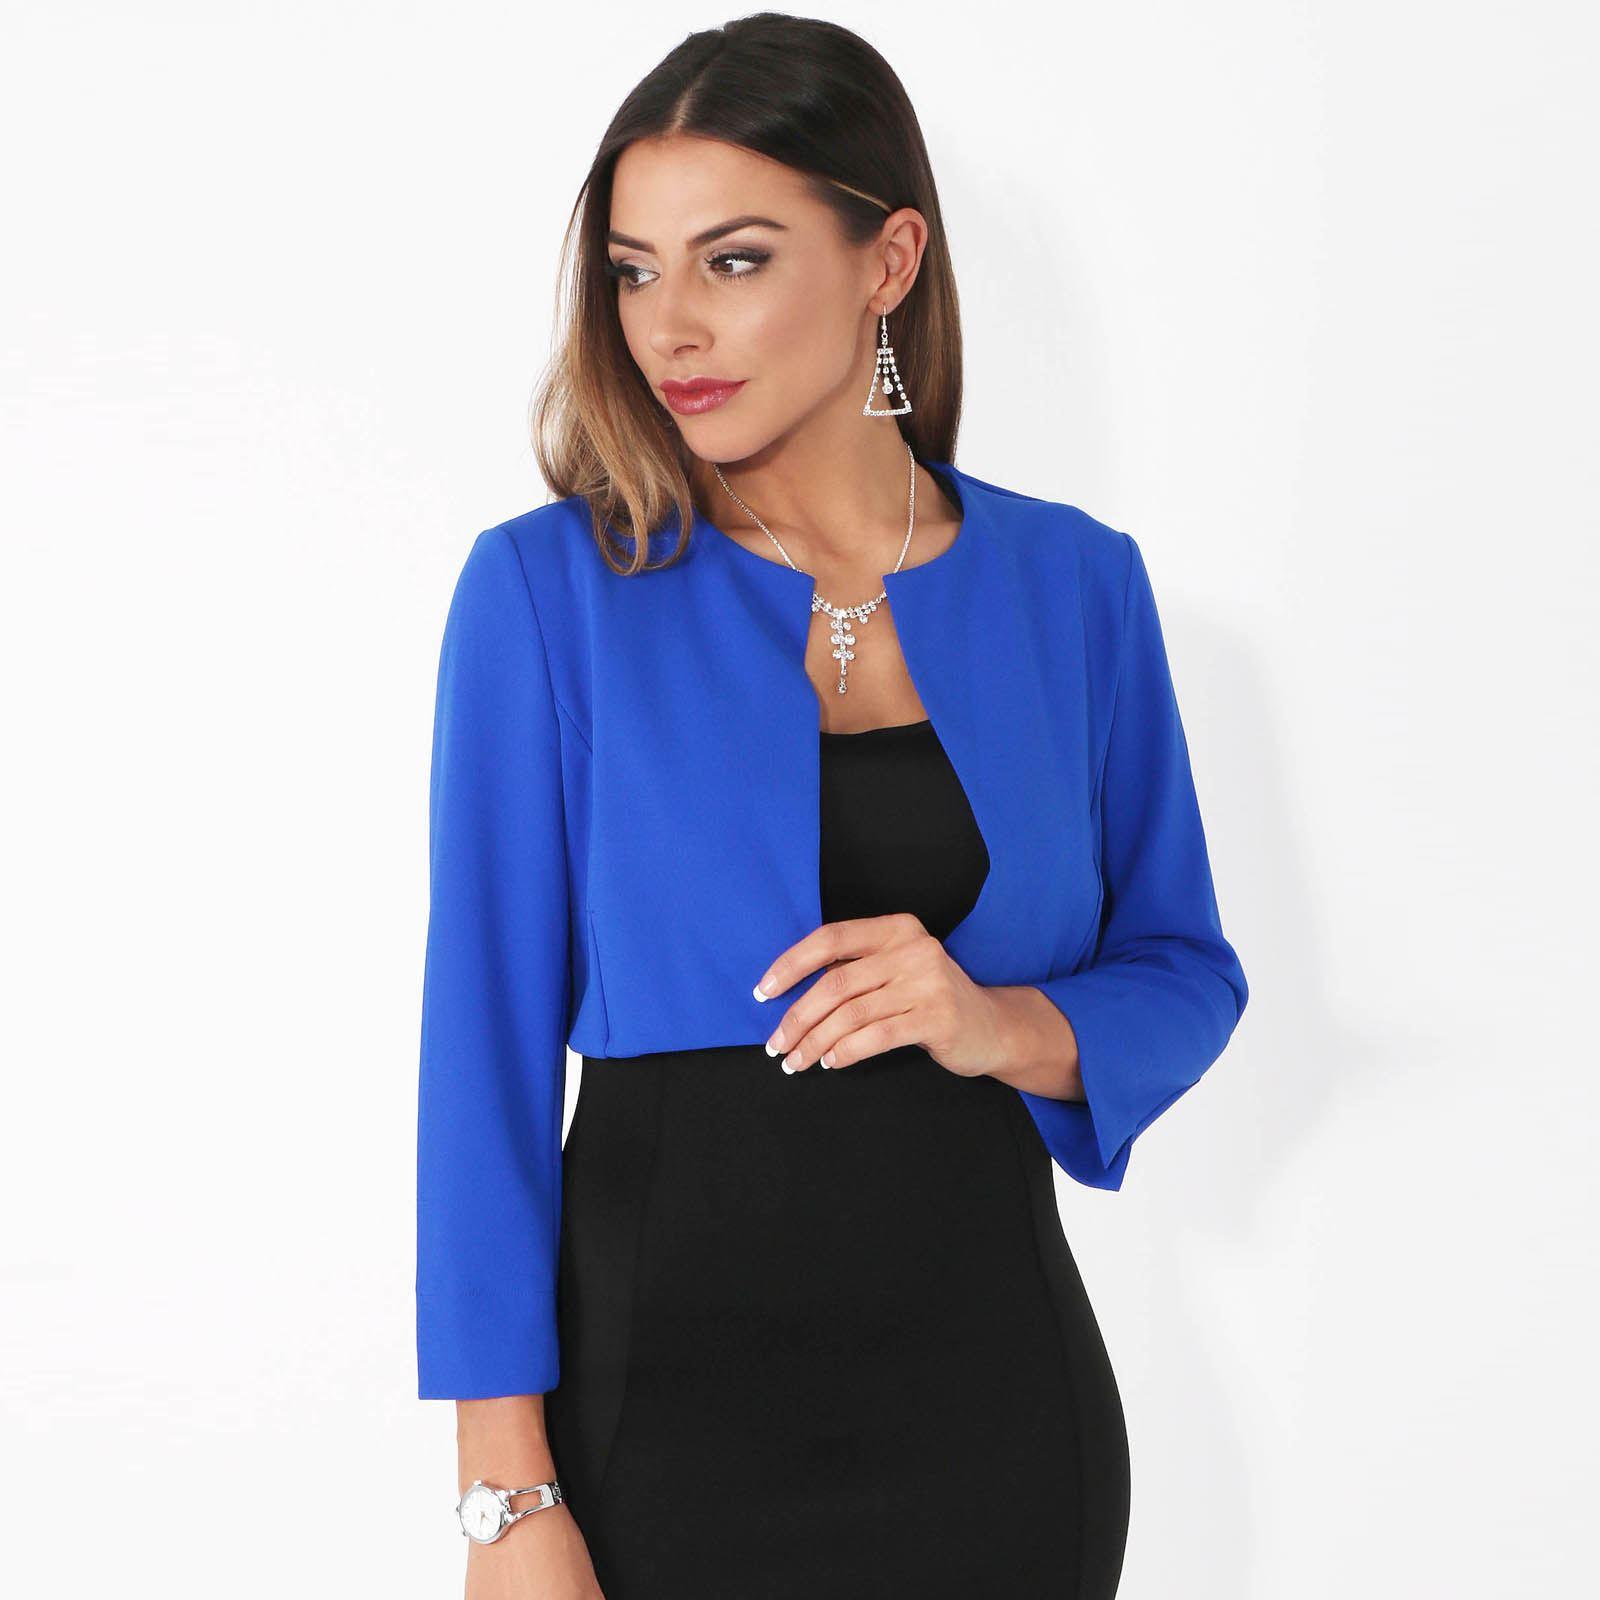 Womens-Ladies-Bolero-Shrug-Crop-Top-Open-Fit-Blazer-Evening-Bow-Jacket-Wedding thumbnail 17